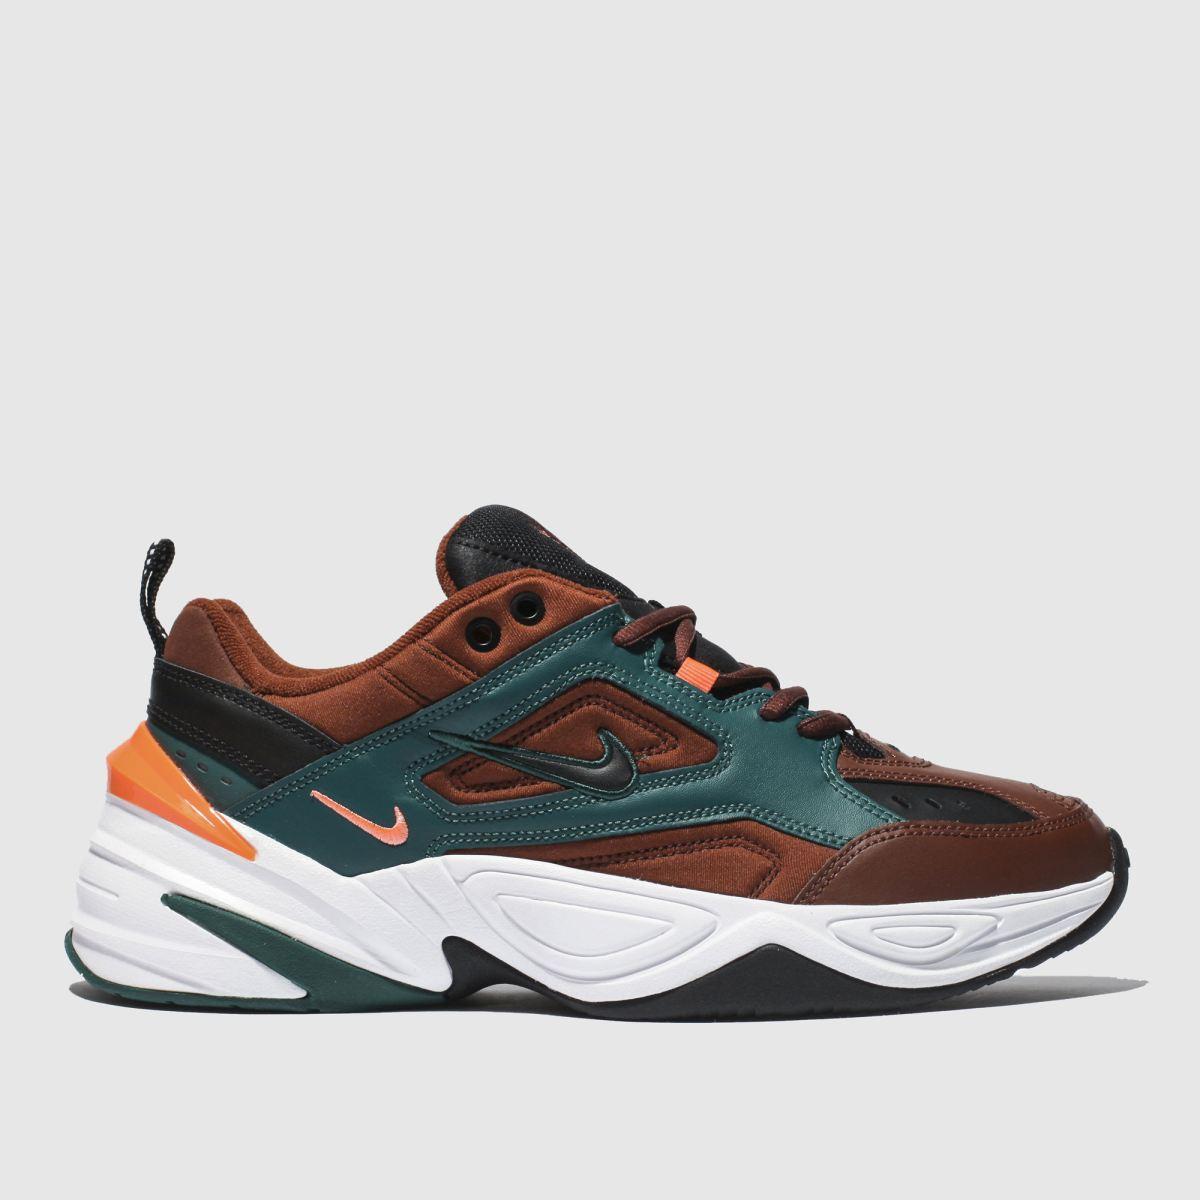 Nike Brown M2k Tekno Trainers